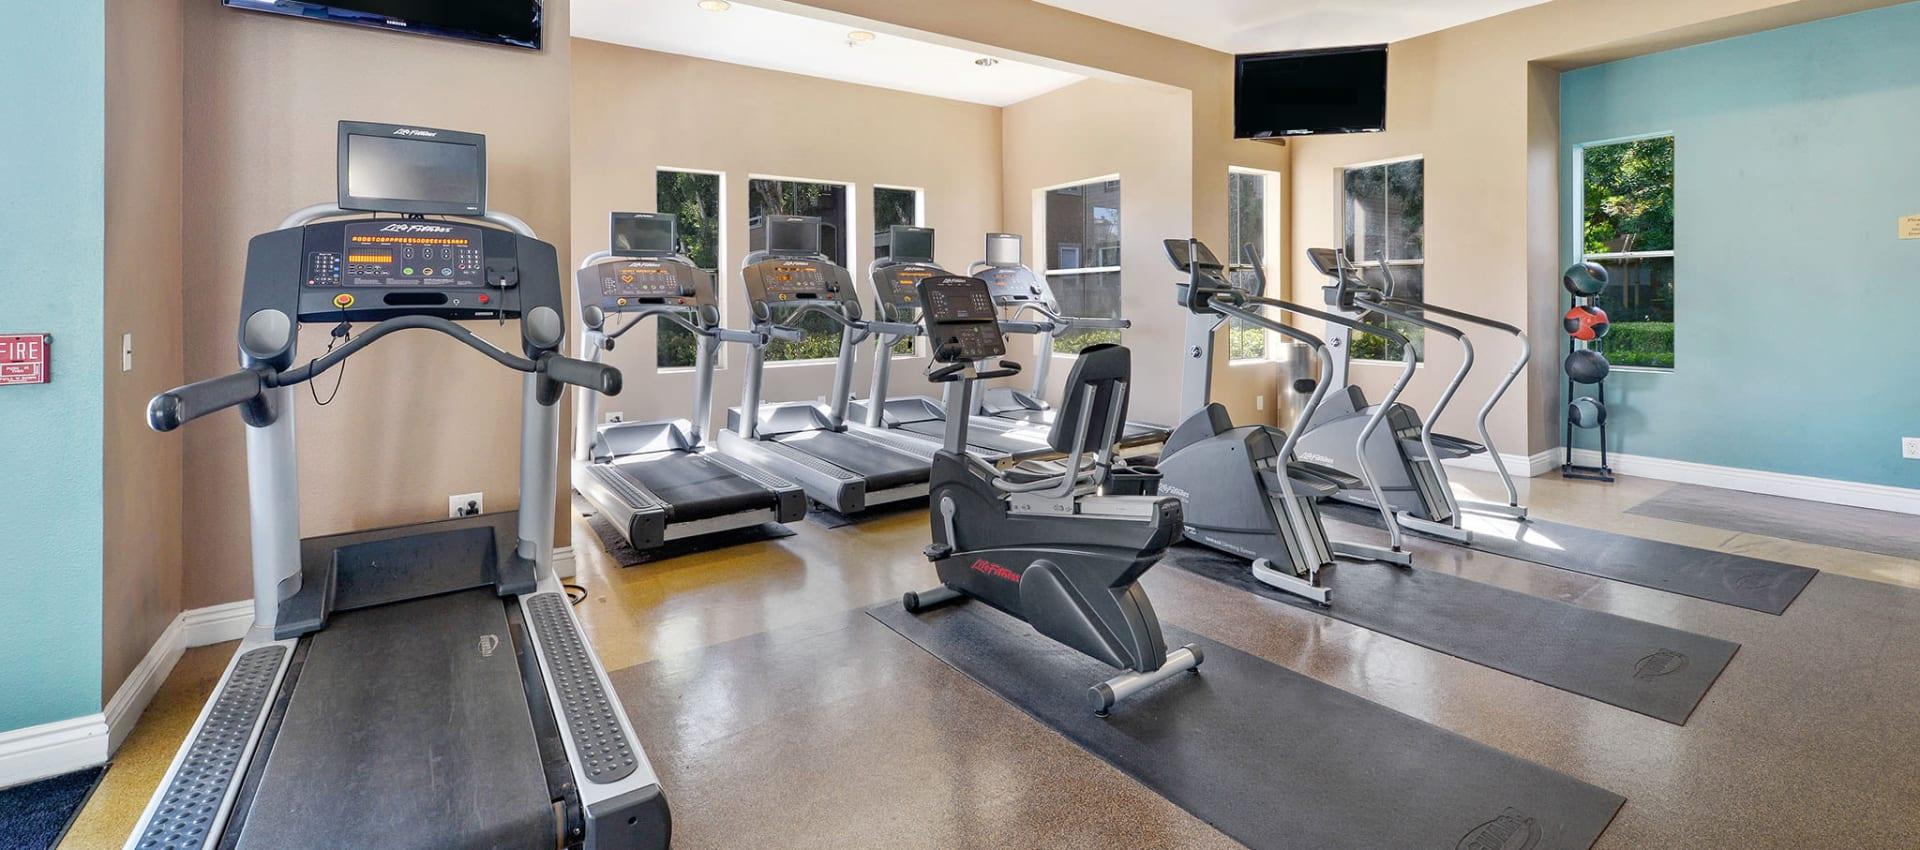 Fitness Center at Rosewalk in San Jose